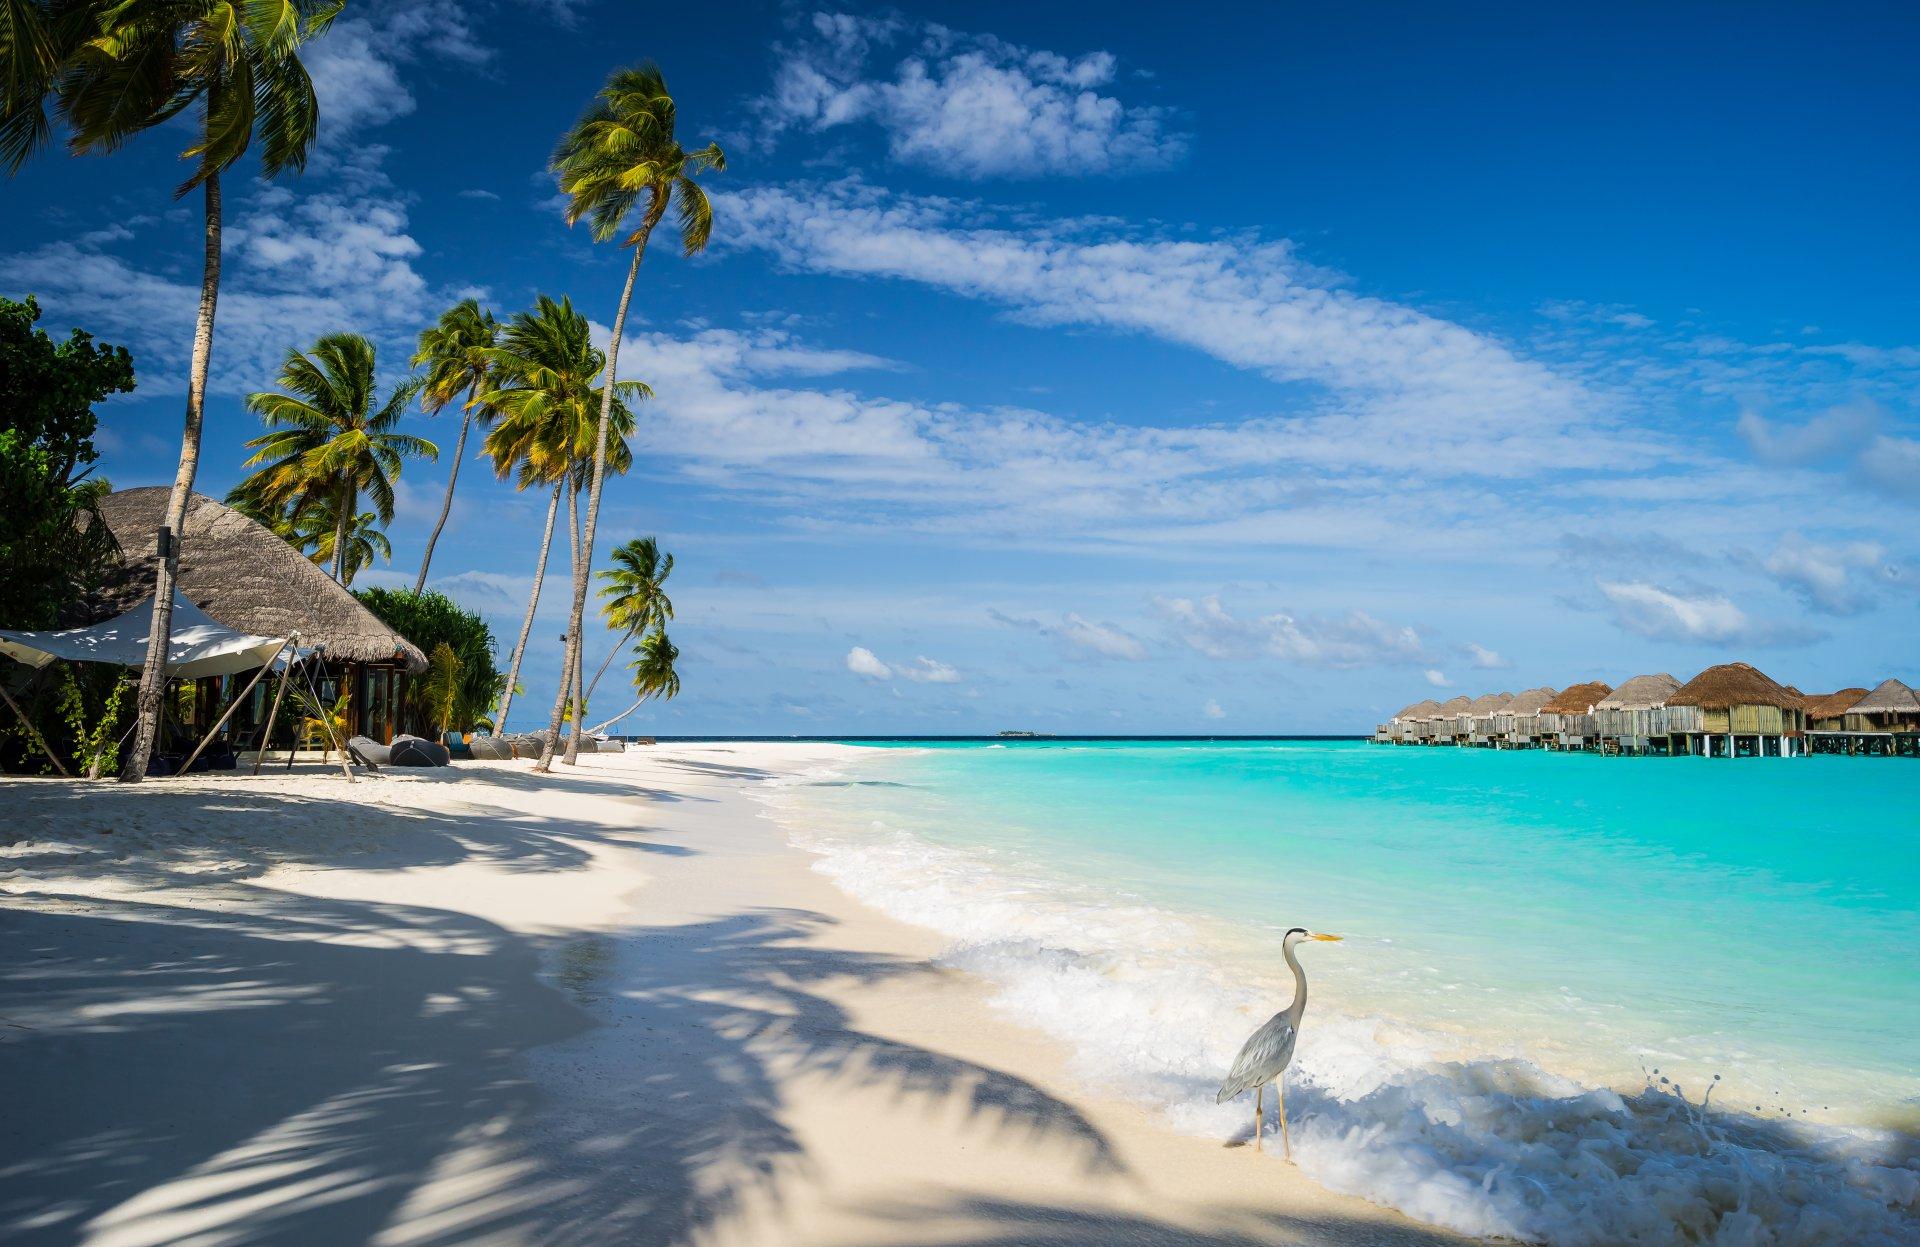 Photography - Tropical  Bird Sea Beach Holiday Tropics Maldives Constance Halaveli Resort Breeze Sky Palm Tree Boat Resort Wallpaper